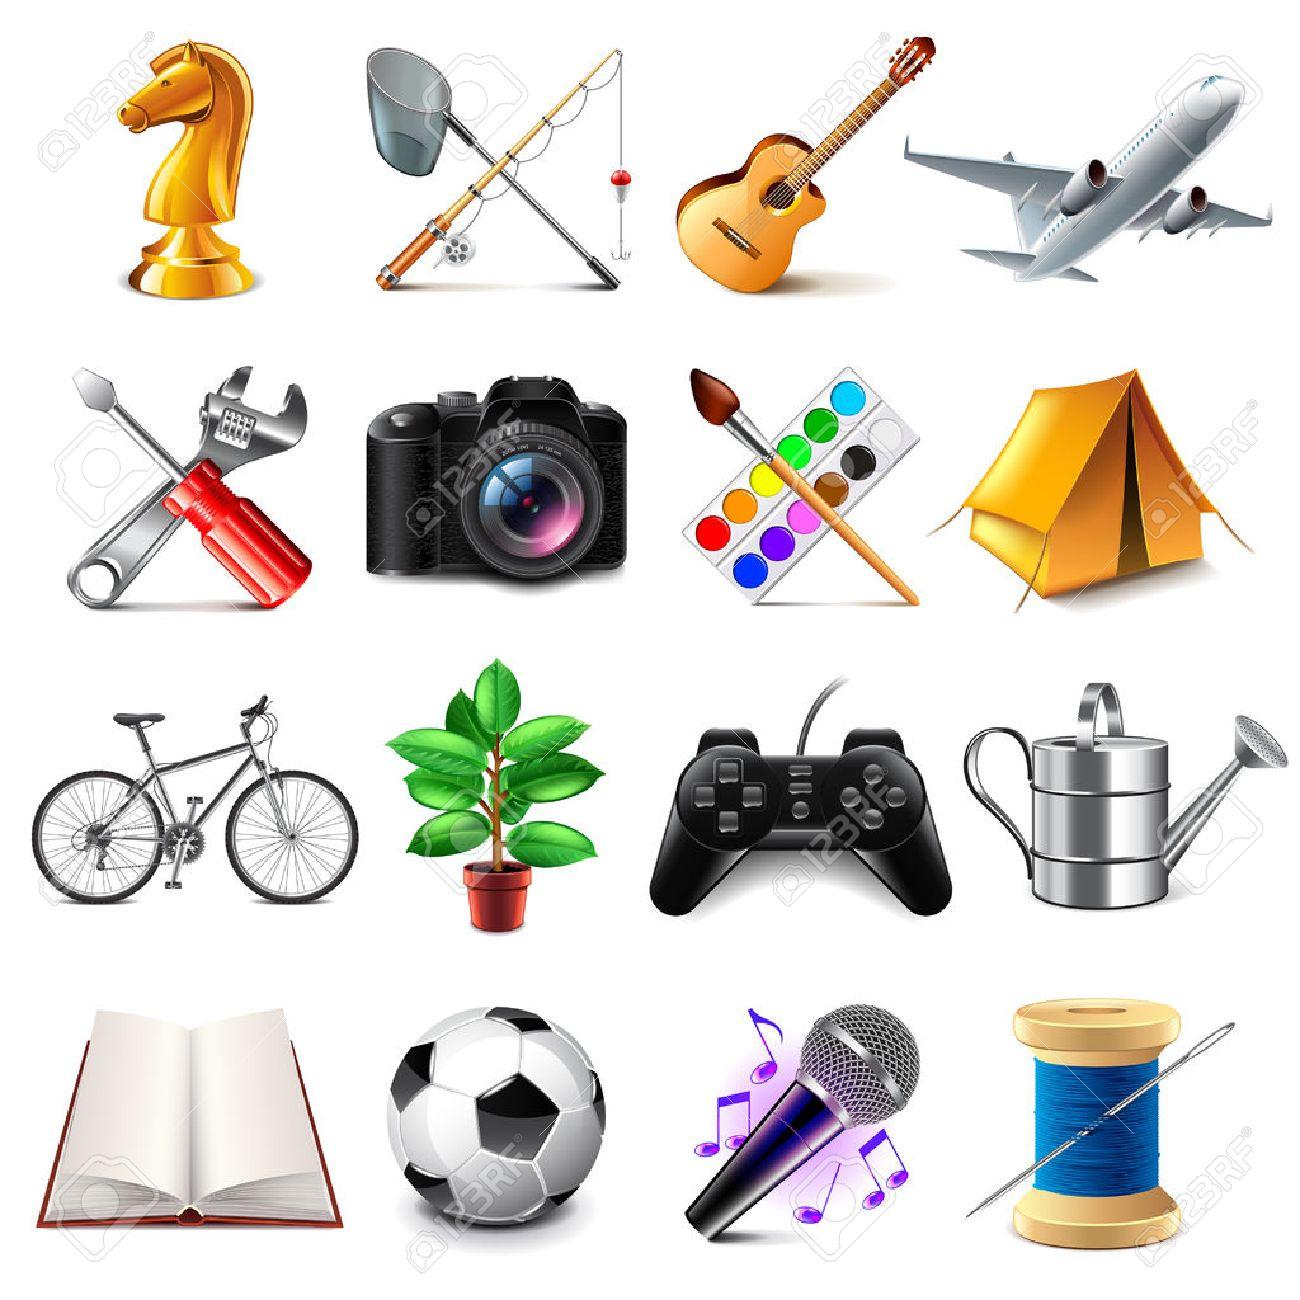 Hobby icons detailed photo realistic set - 56713895